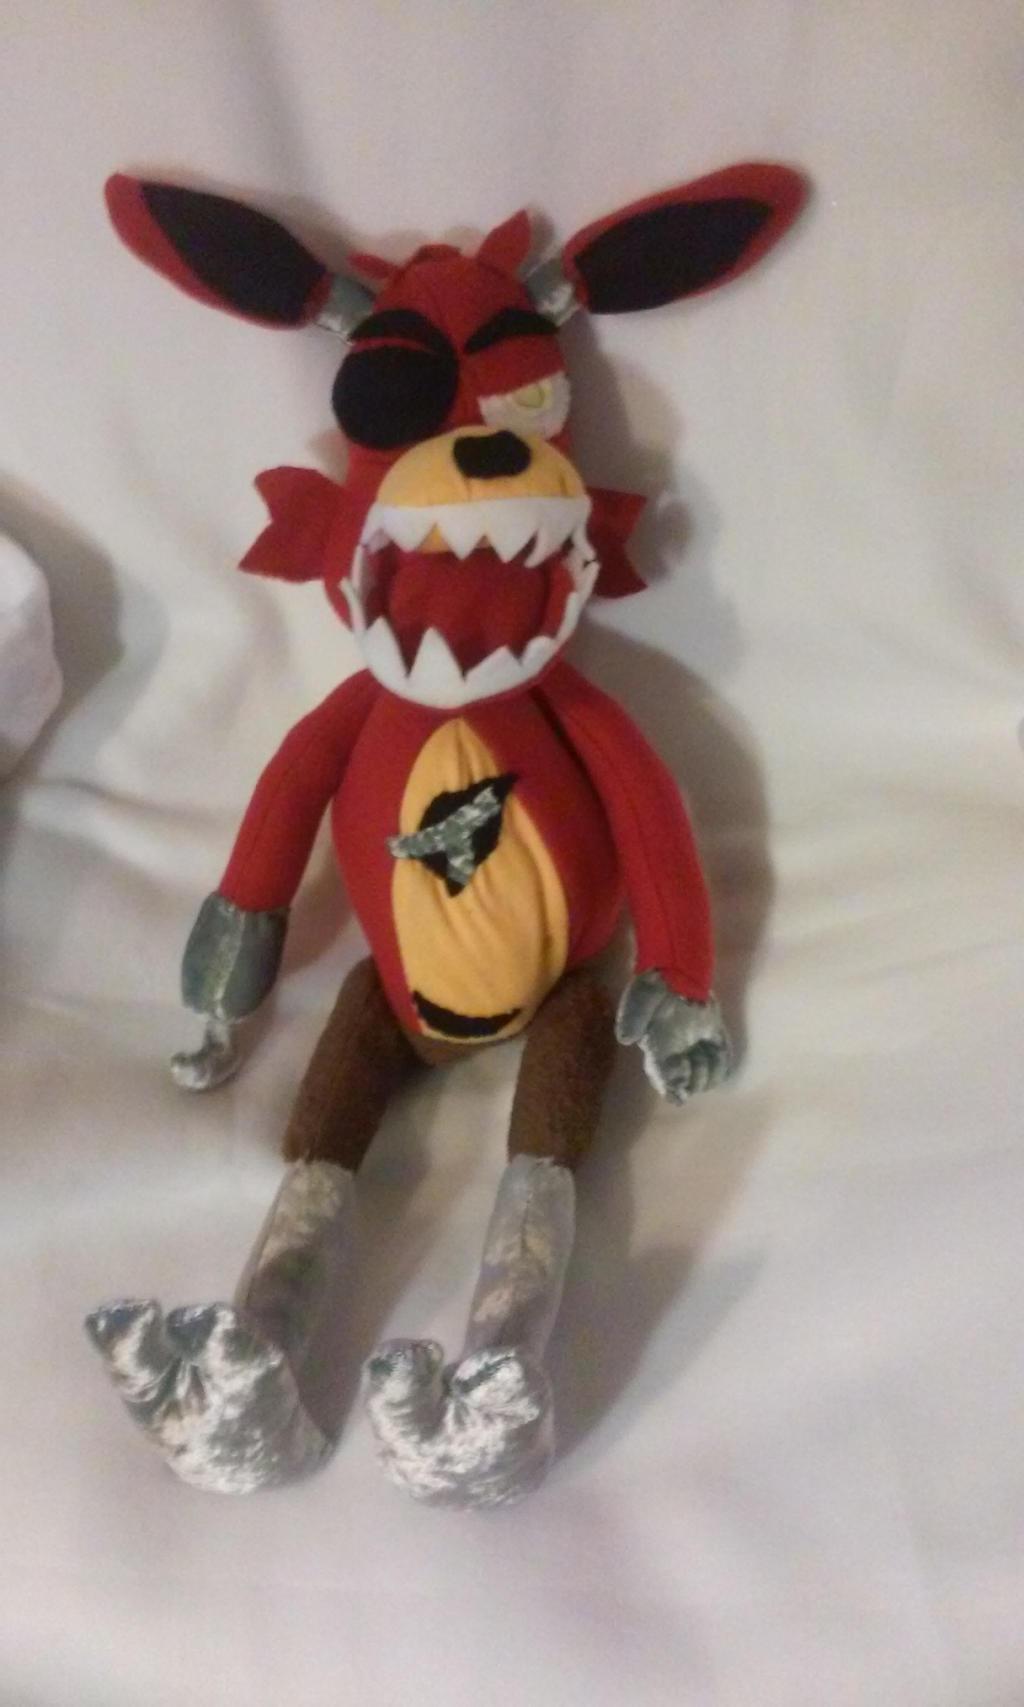 Models of foxy plush toy for sale on ebay fnaf my ideas bedroom